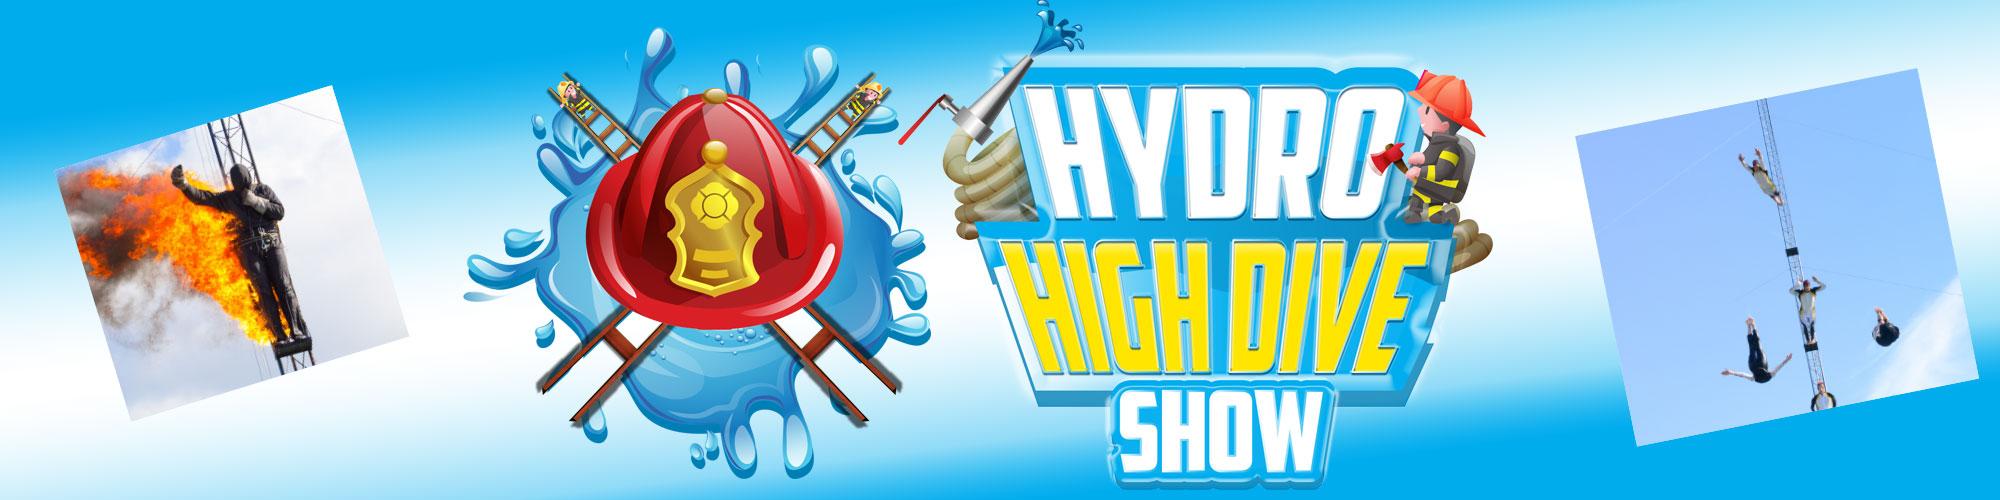 High Dive Show